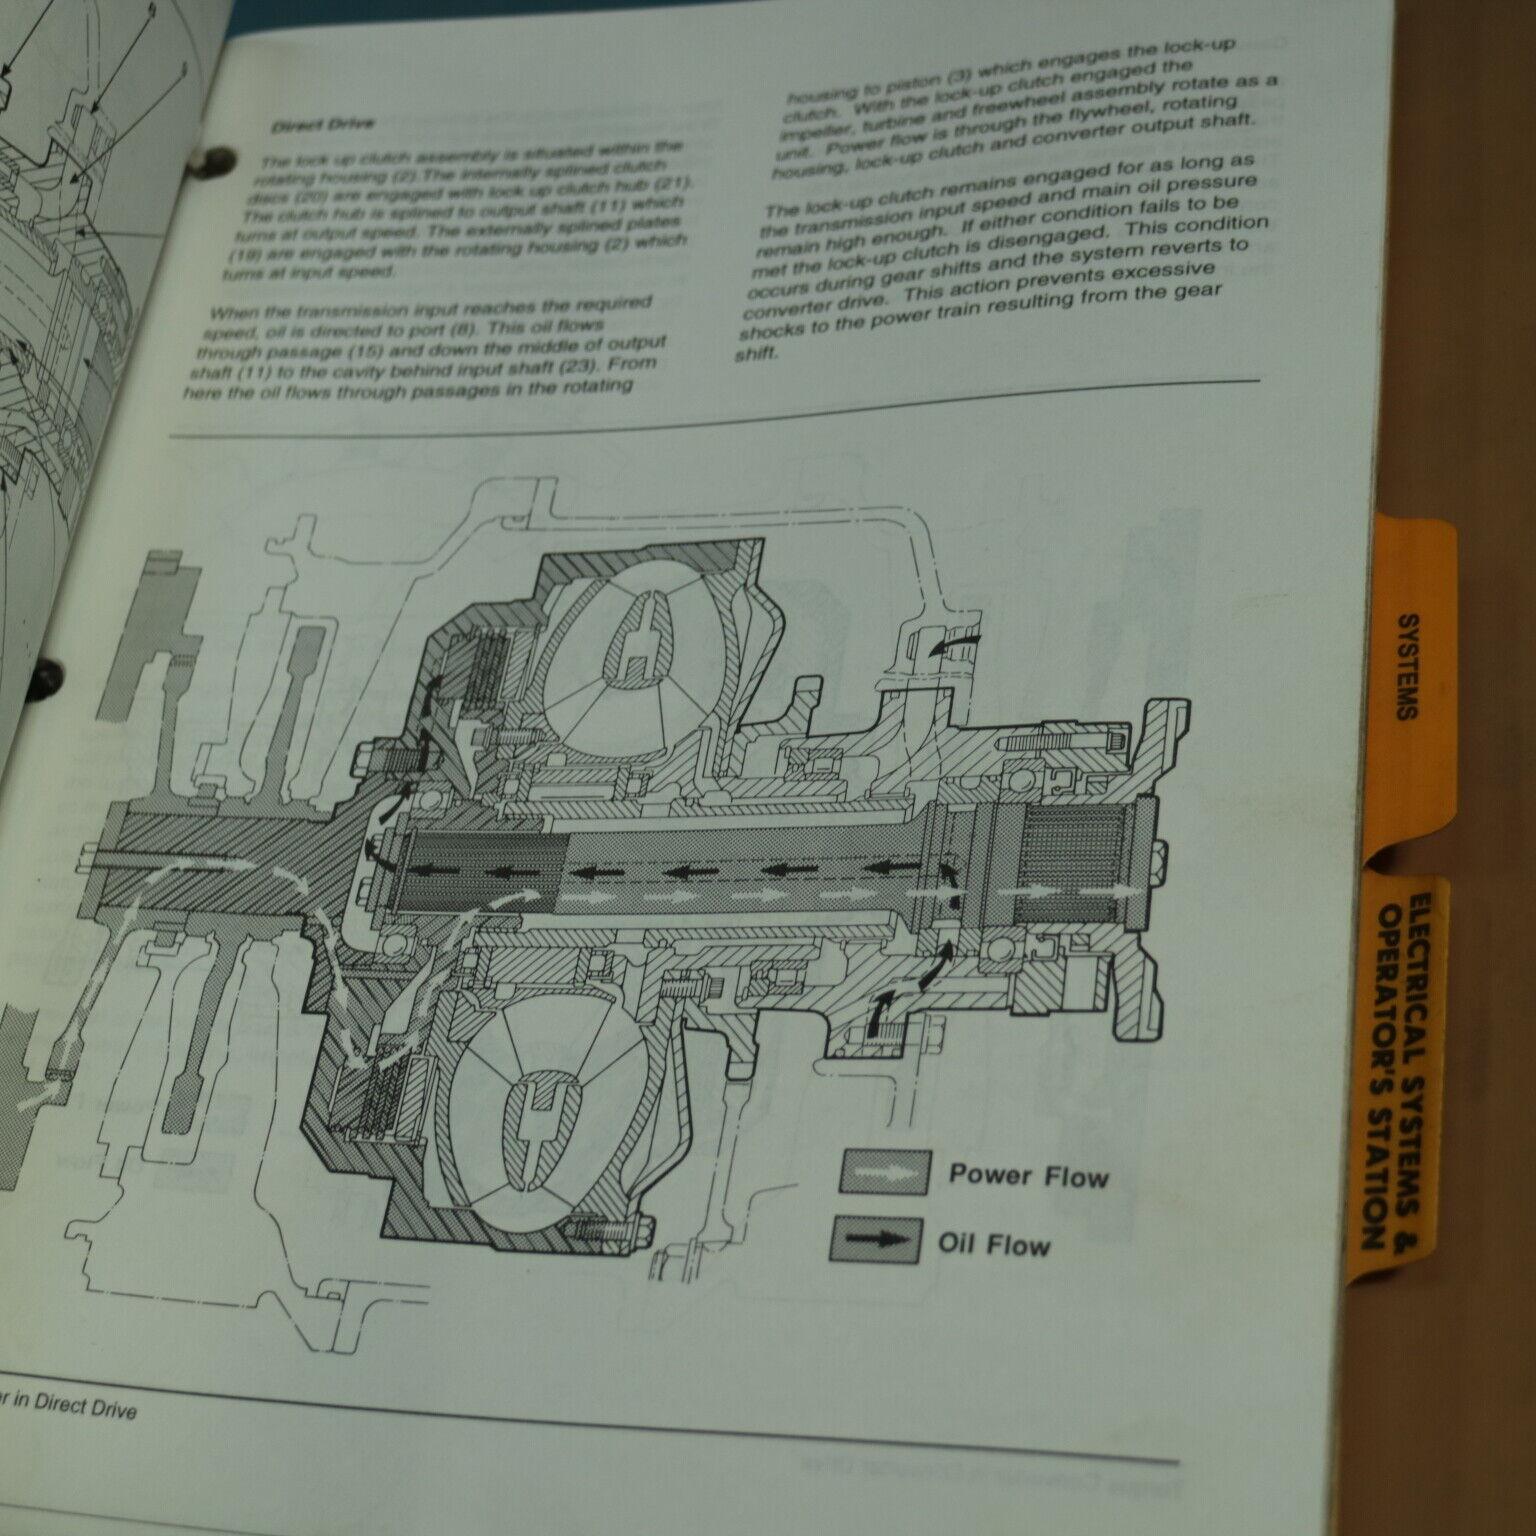 CAT D350e & D400e Articulated Trucks Service Manual W/ Schematics - SENR8675